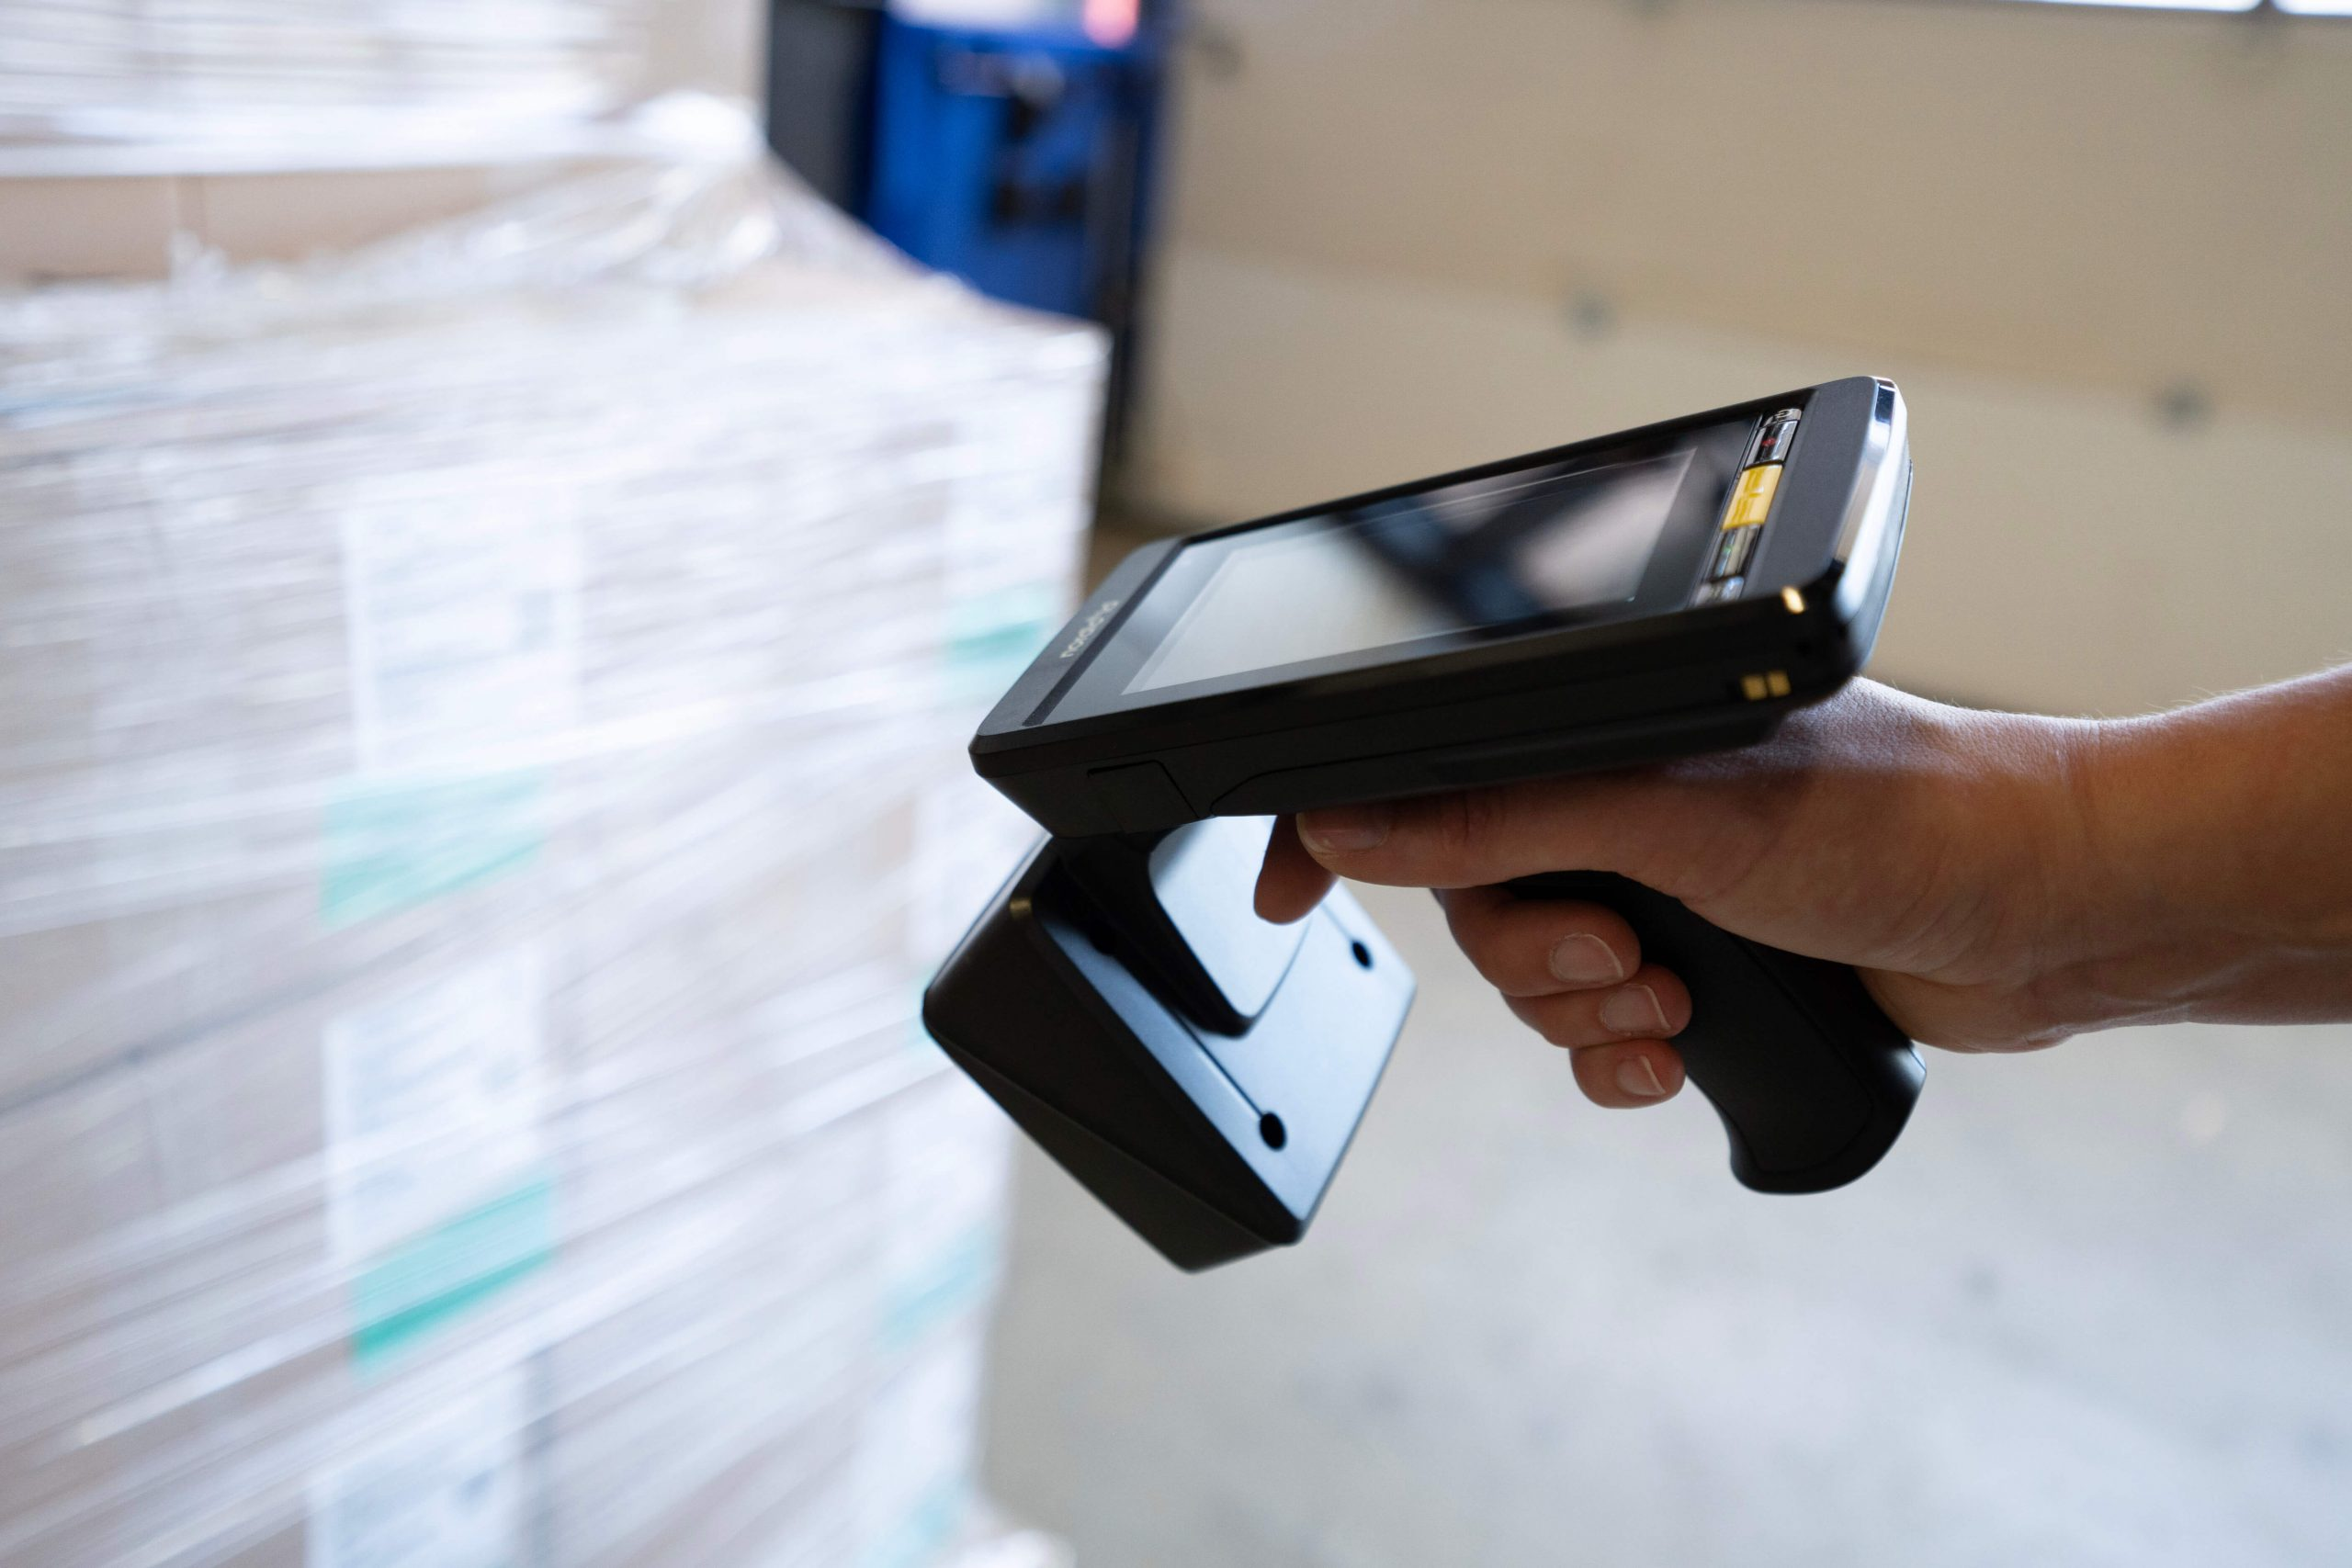 RFID reader in action